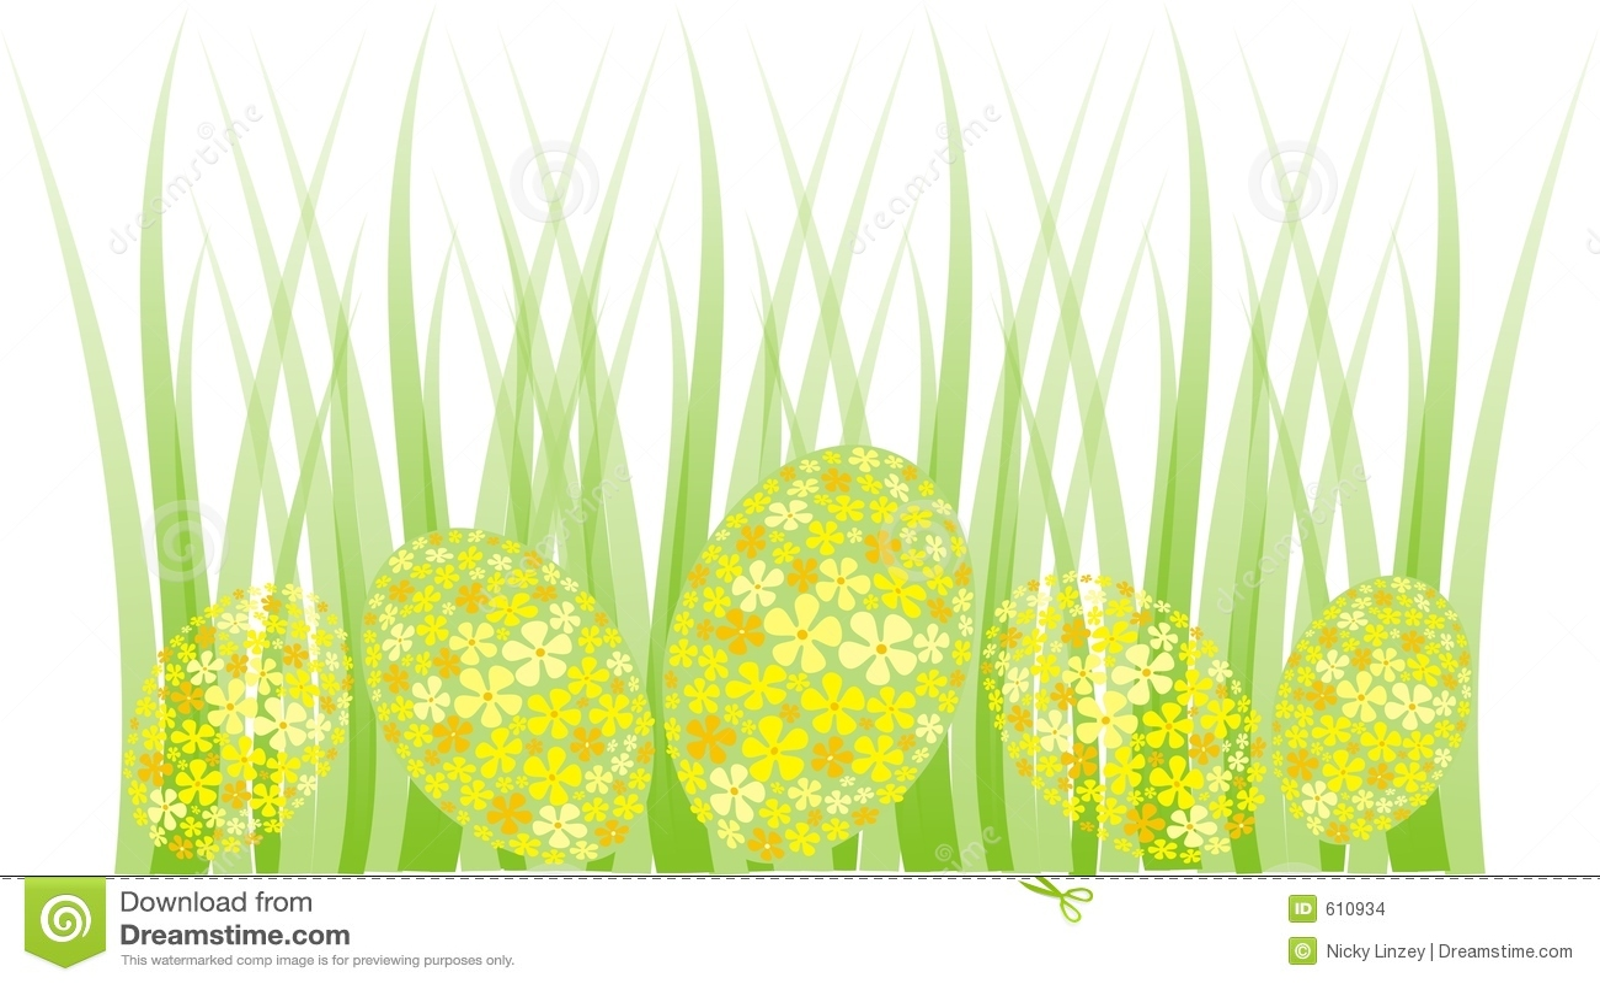 Easter Egg Grass Border Stock Images - Image: 610934